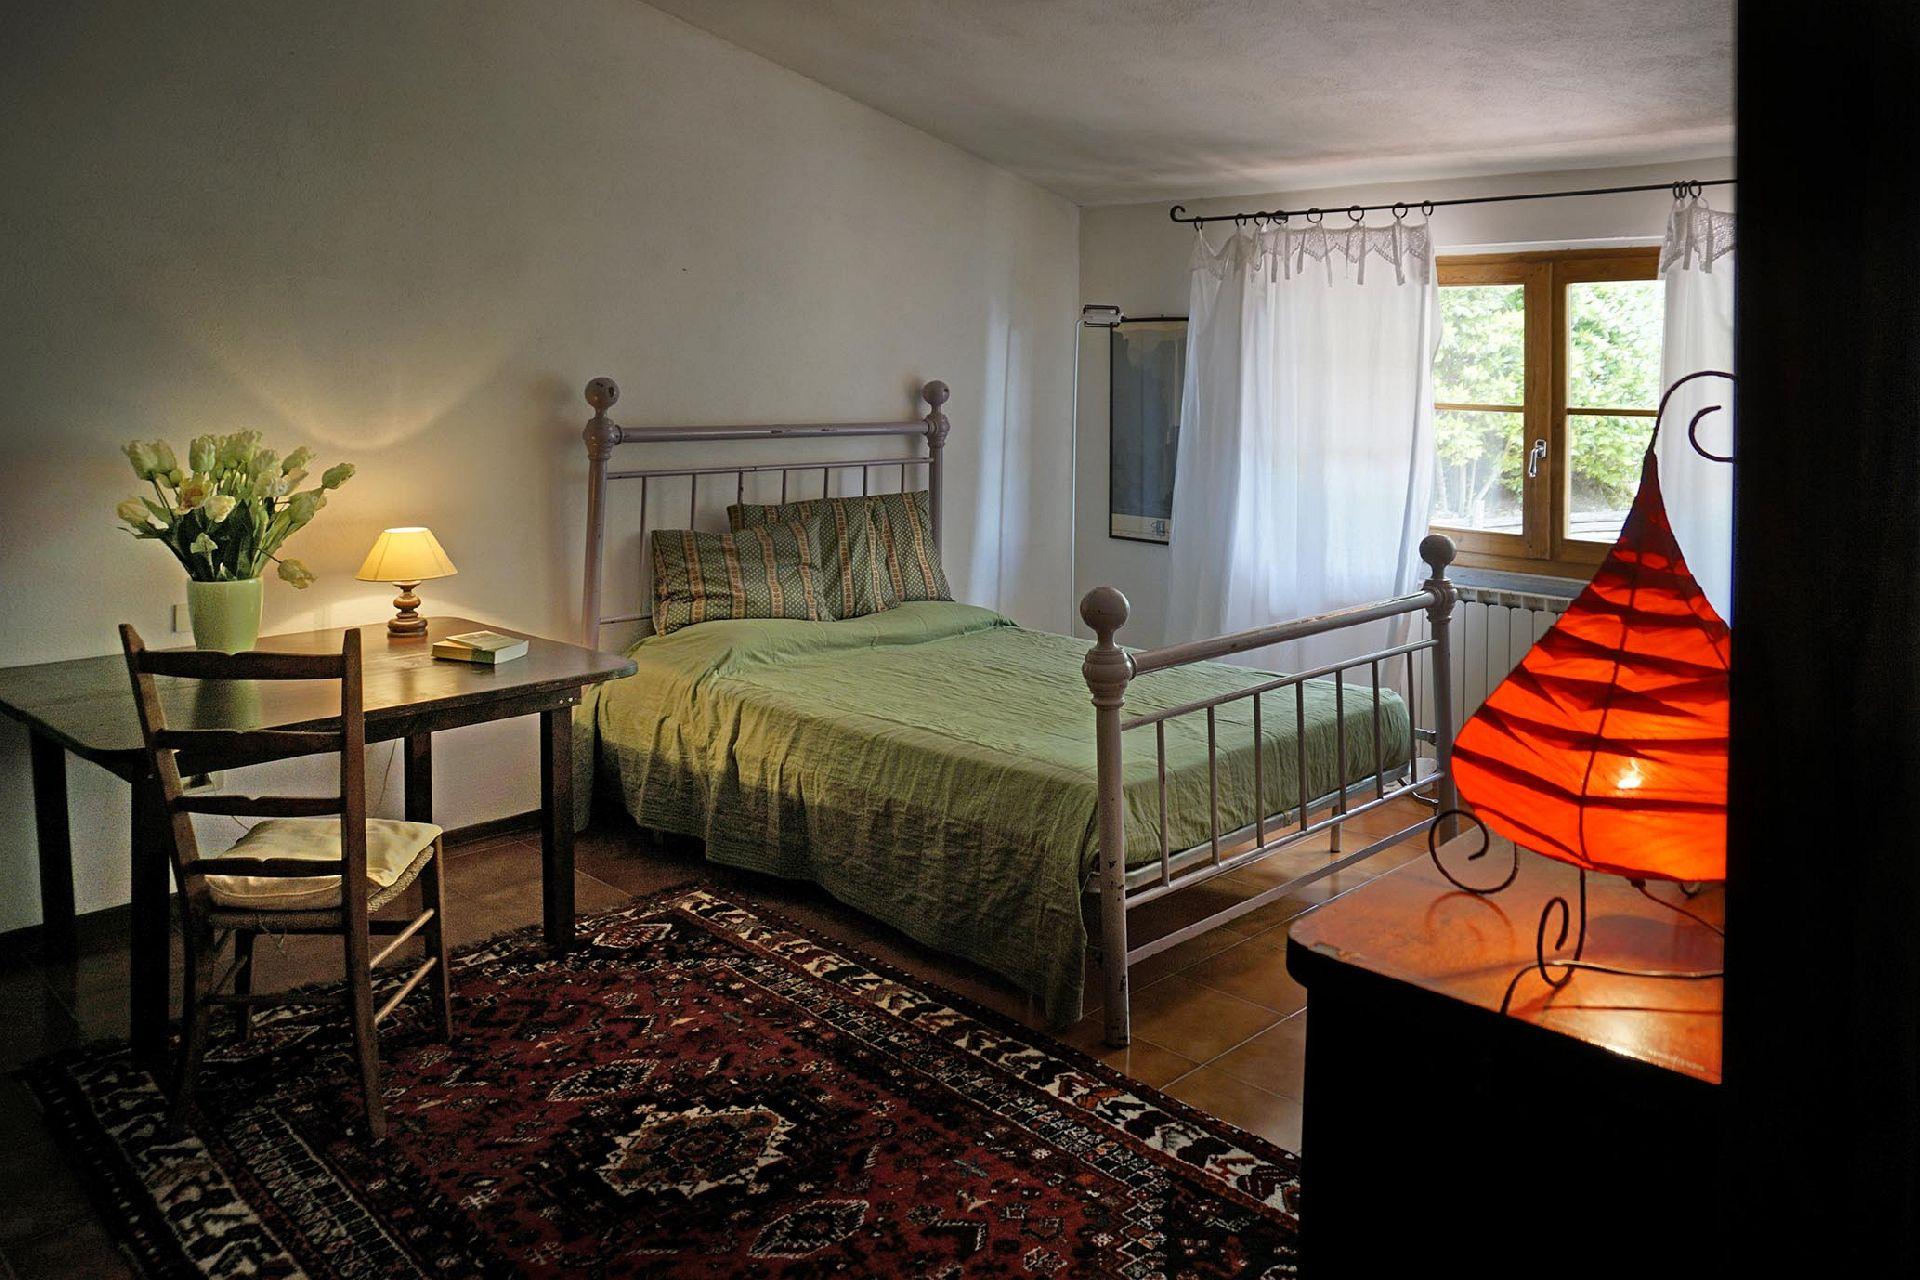 wlan strahlung schlafzimmer bettdecken bergr e test ikea wuppertal schlafzimmer tapete grau. Black Bedroom Furniture Sets. Home Design Ideas